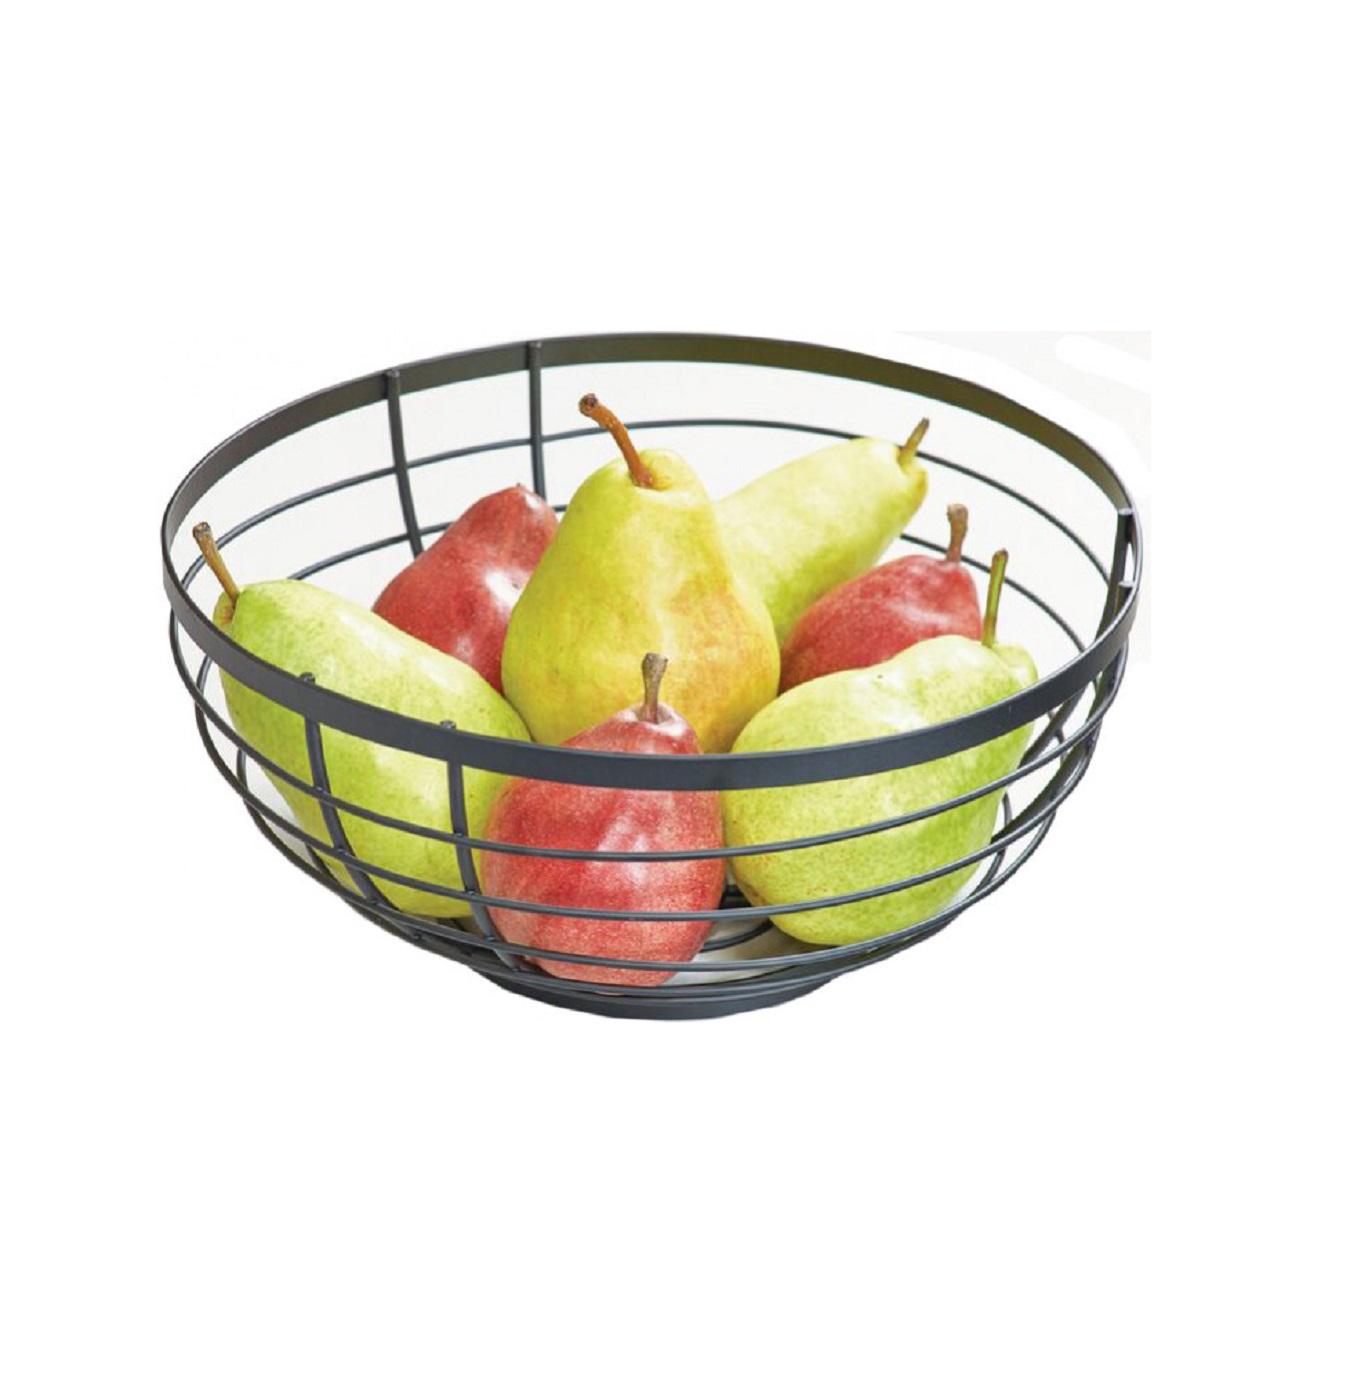 Онлайн каталог PROMENU: Корзина для фруктов iDesign AUSTIN, 27,3х27,3х12 см, черный Interdesign 51747EU